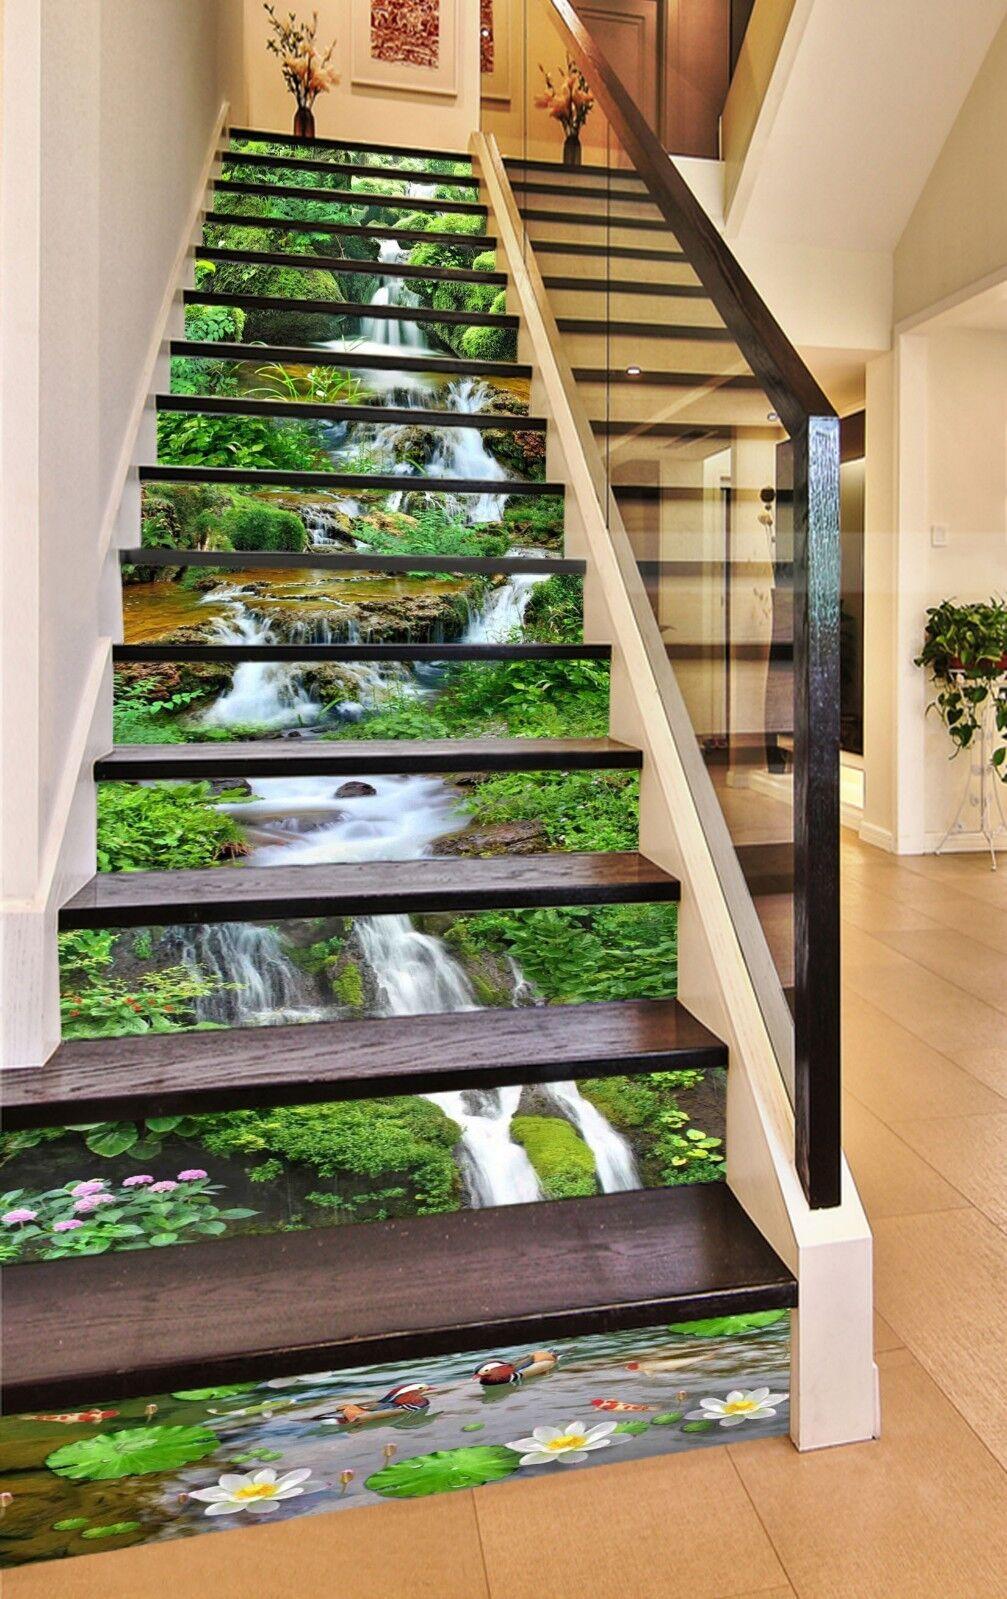 3D Grass River Stair Risers Decoration Photo Mural Vinyl Decal Wallpaper US